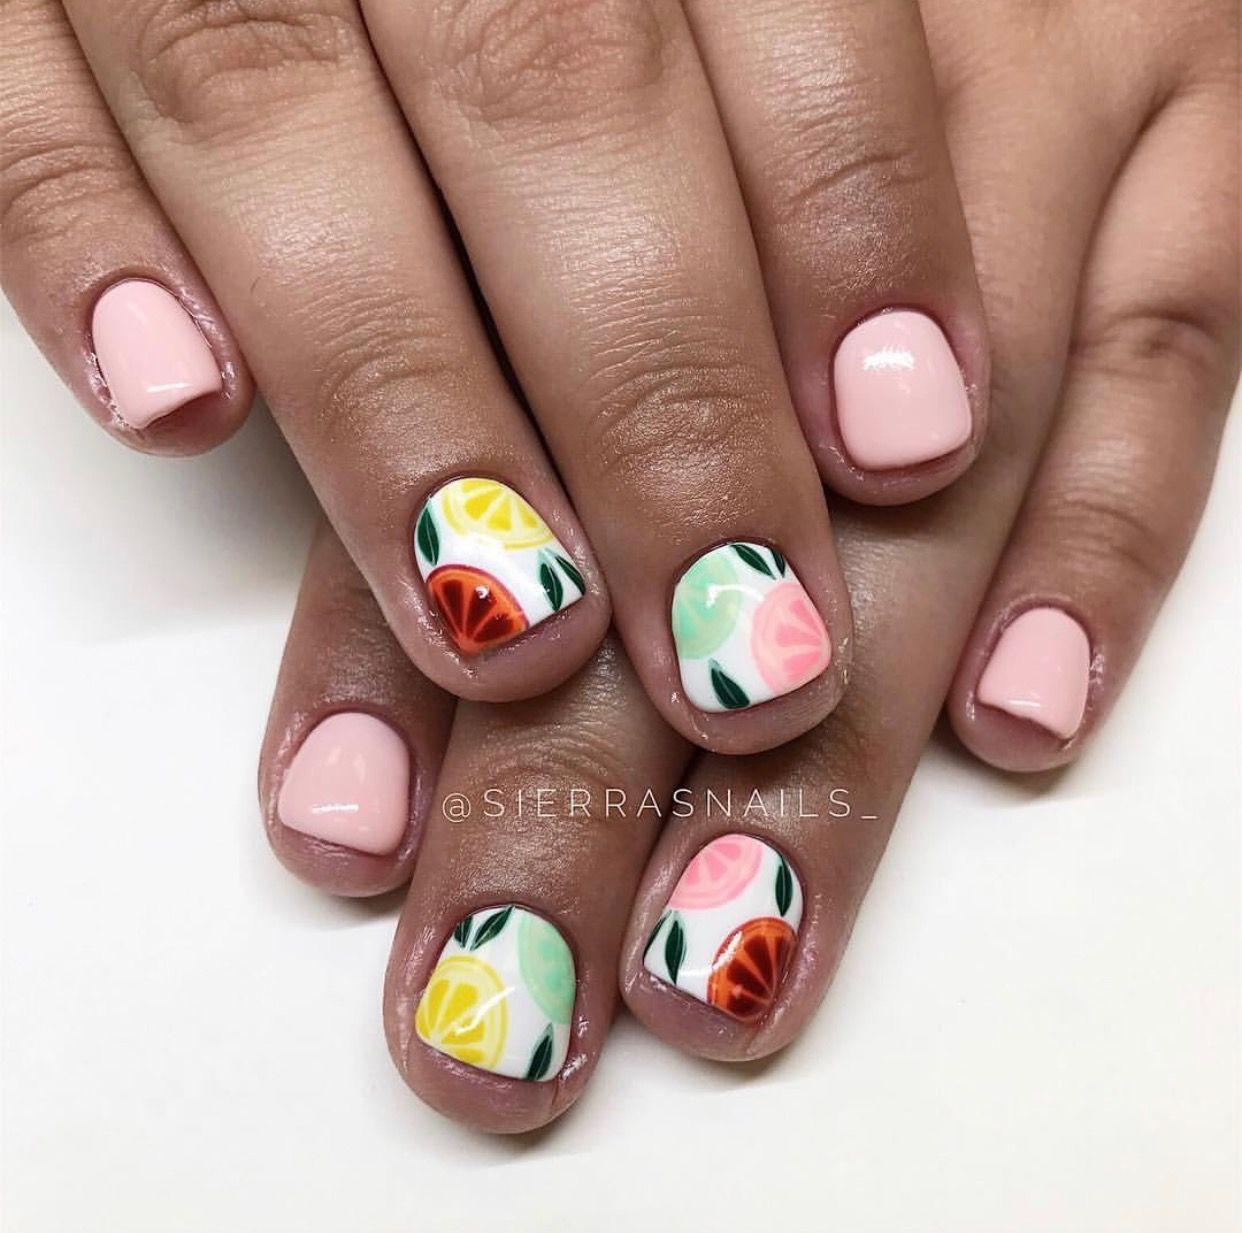 Pin by autumn sexton on nails pinterest manicura uña decoradas